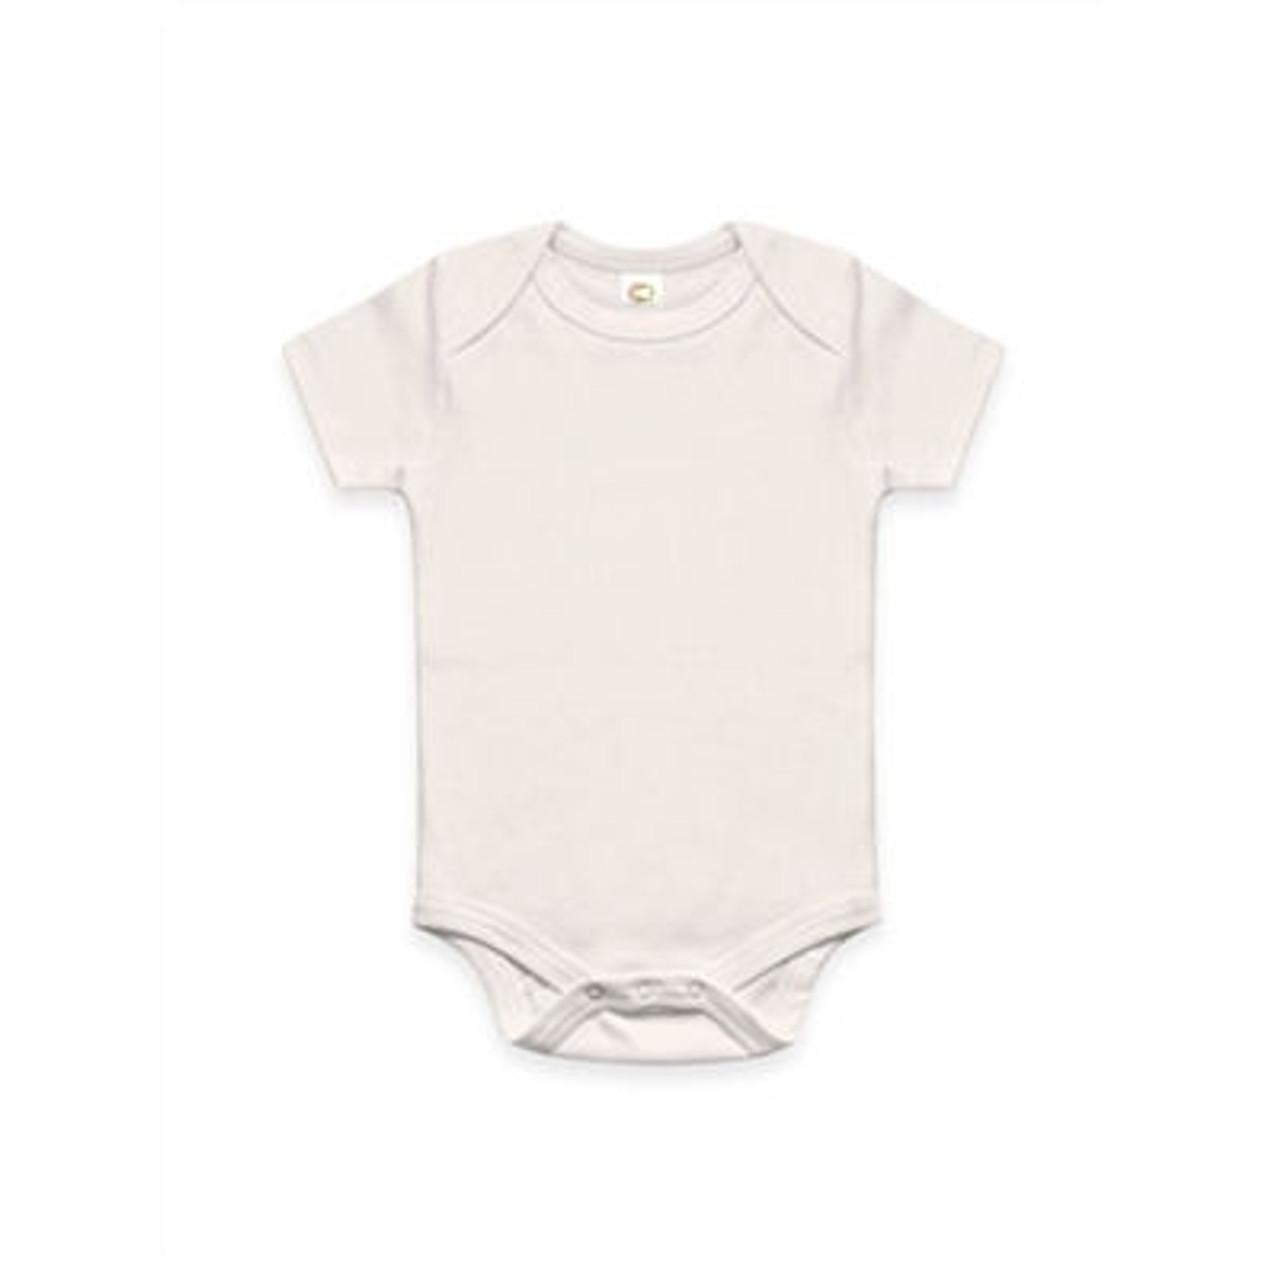 Organic Natural Bodysuit - 6-12 months